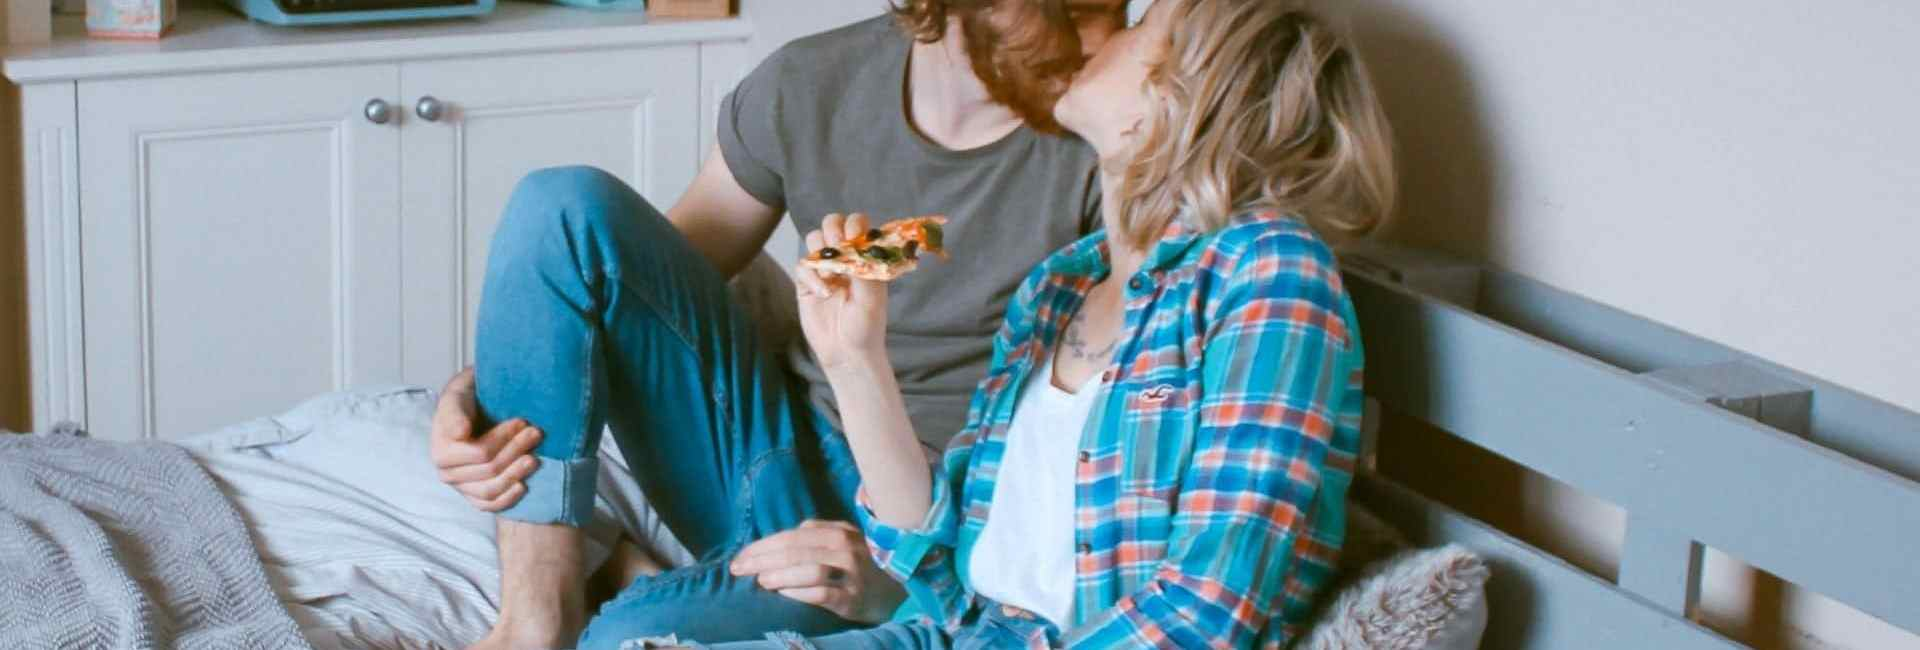 Couple pizza